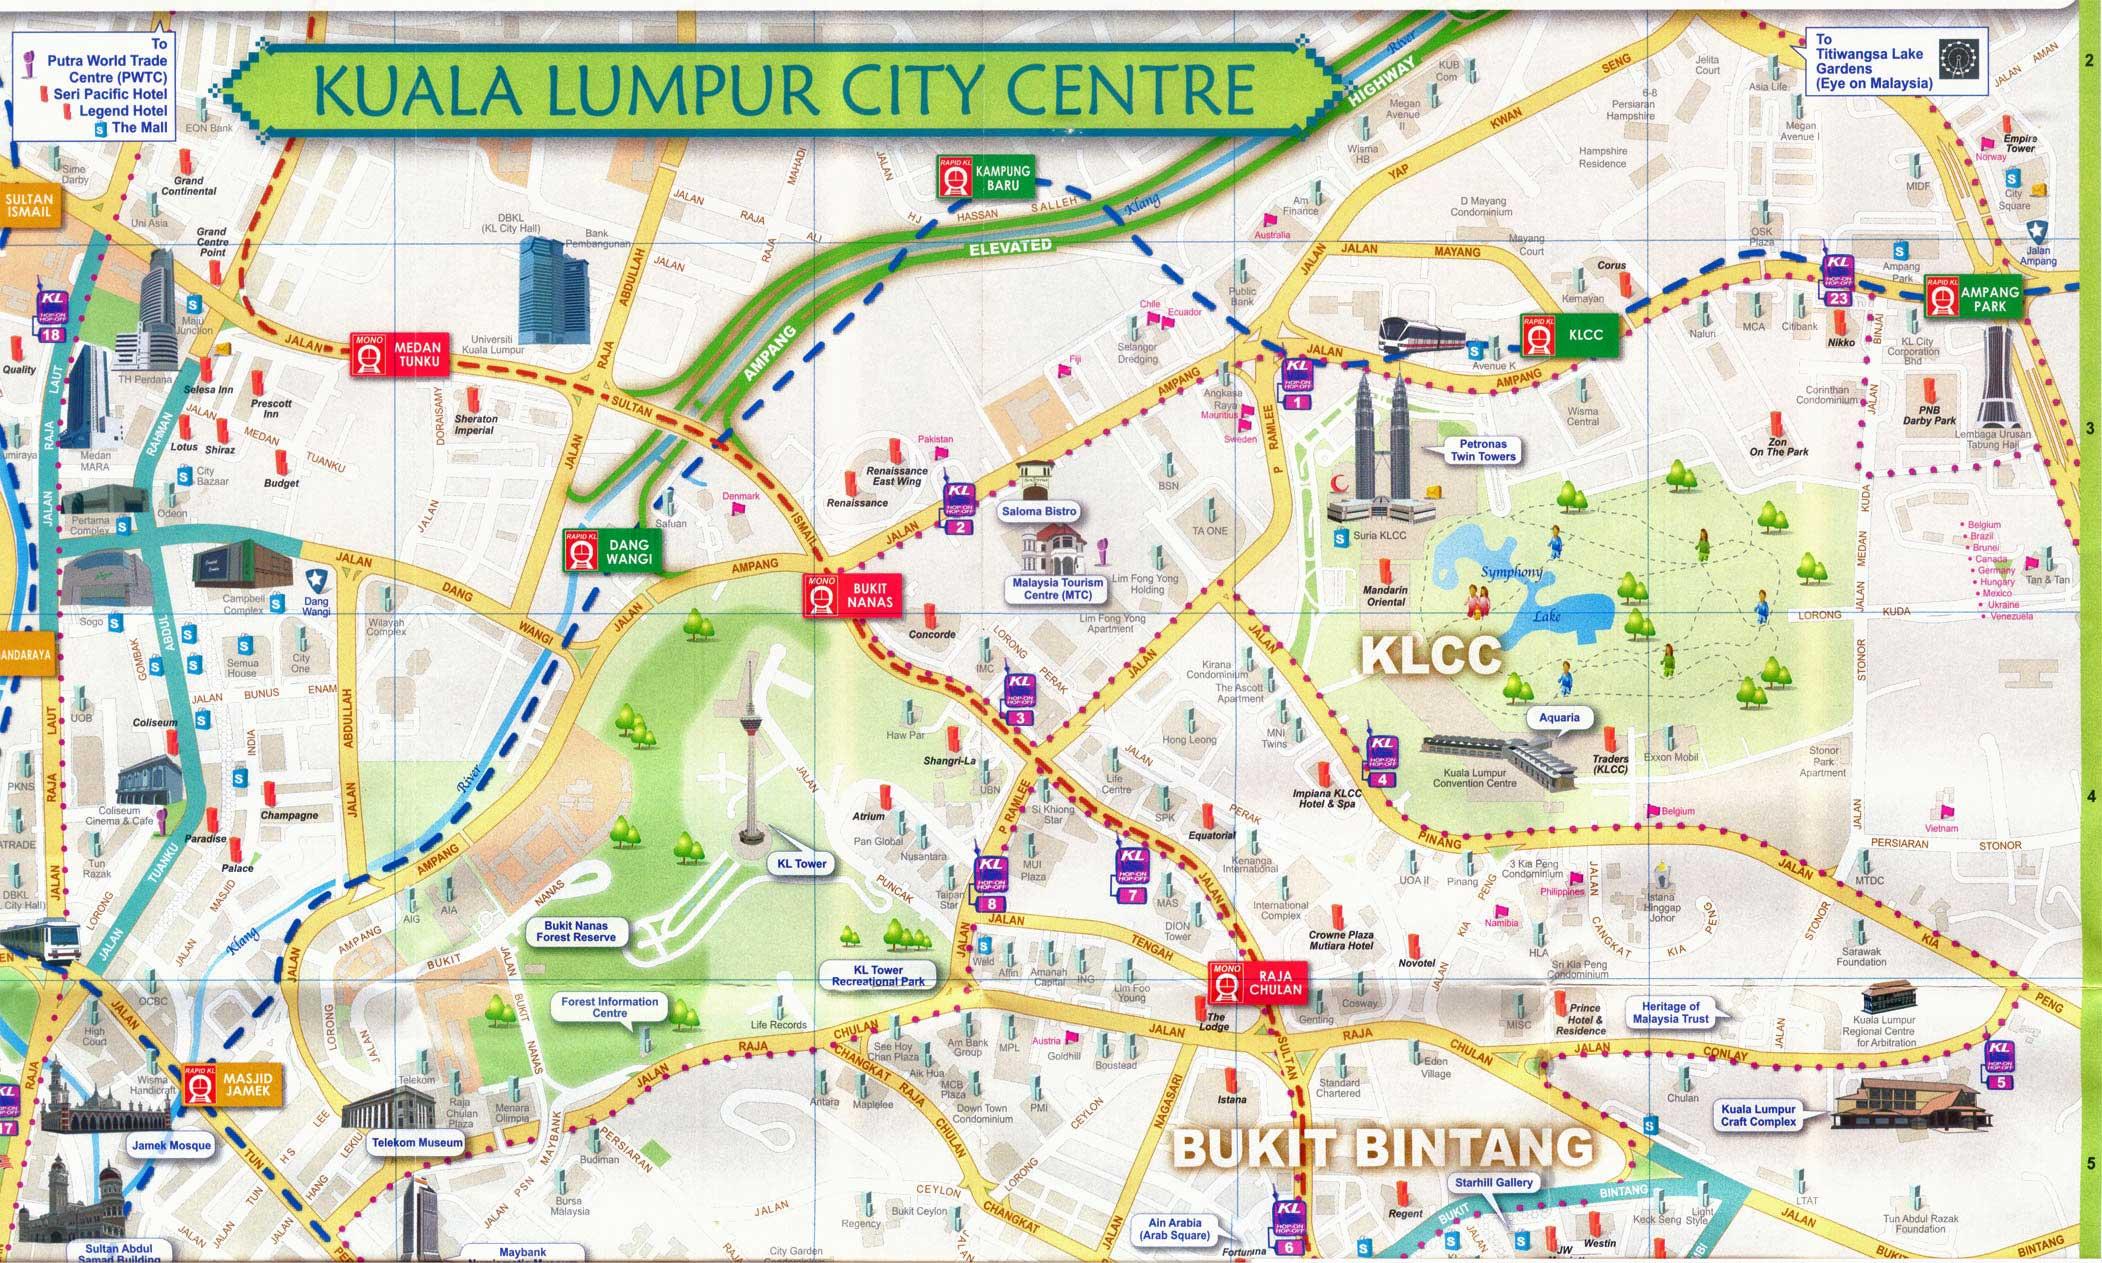 Kuala Lumpur Maps And Travel Guide